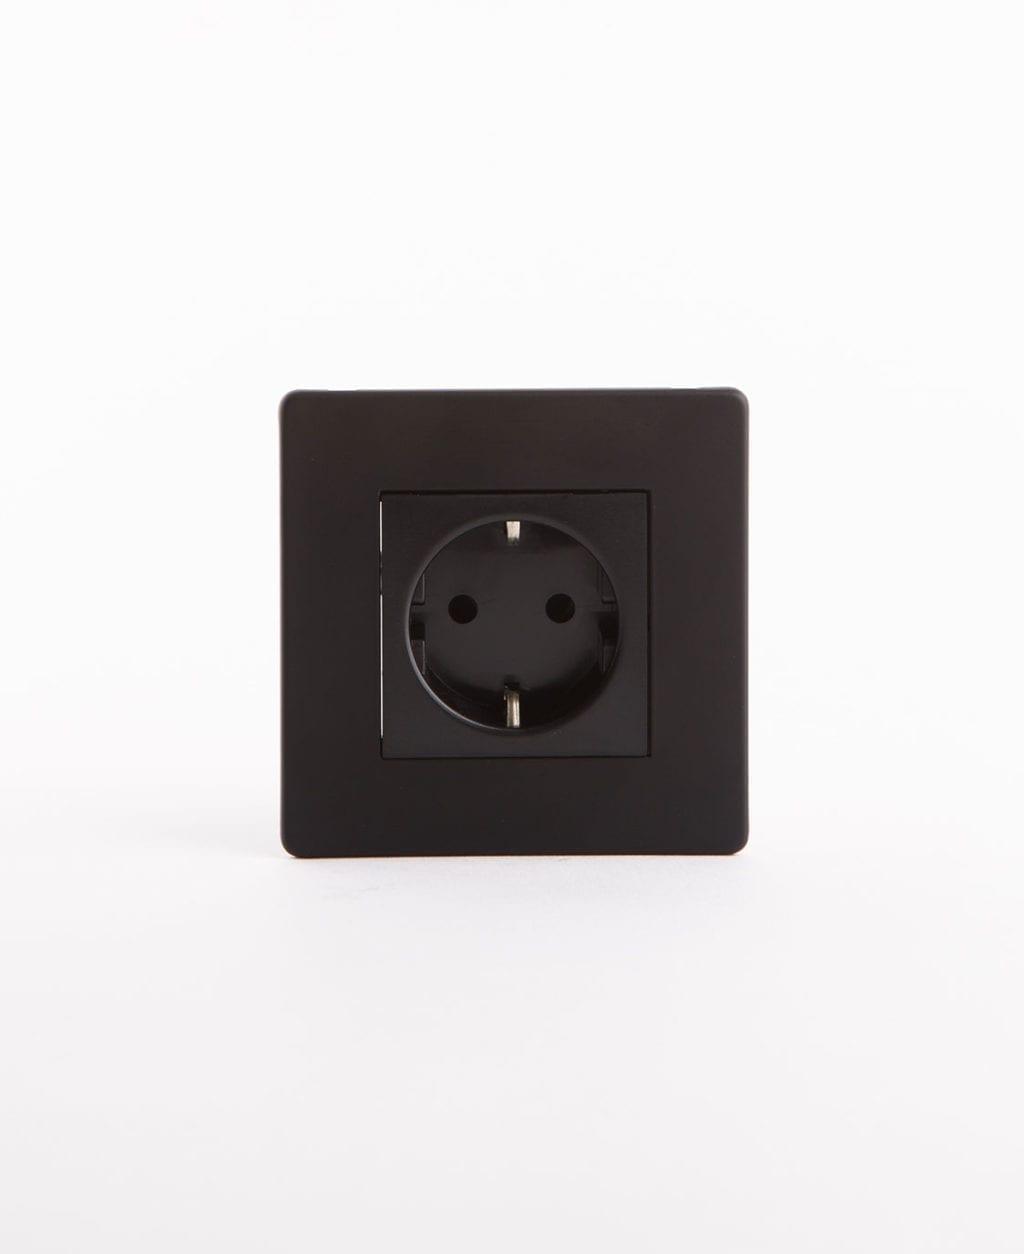 Schuko black single socket